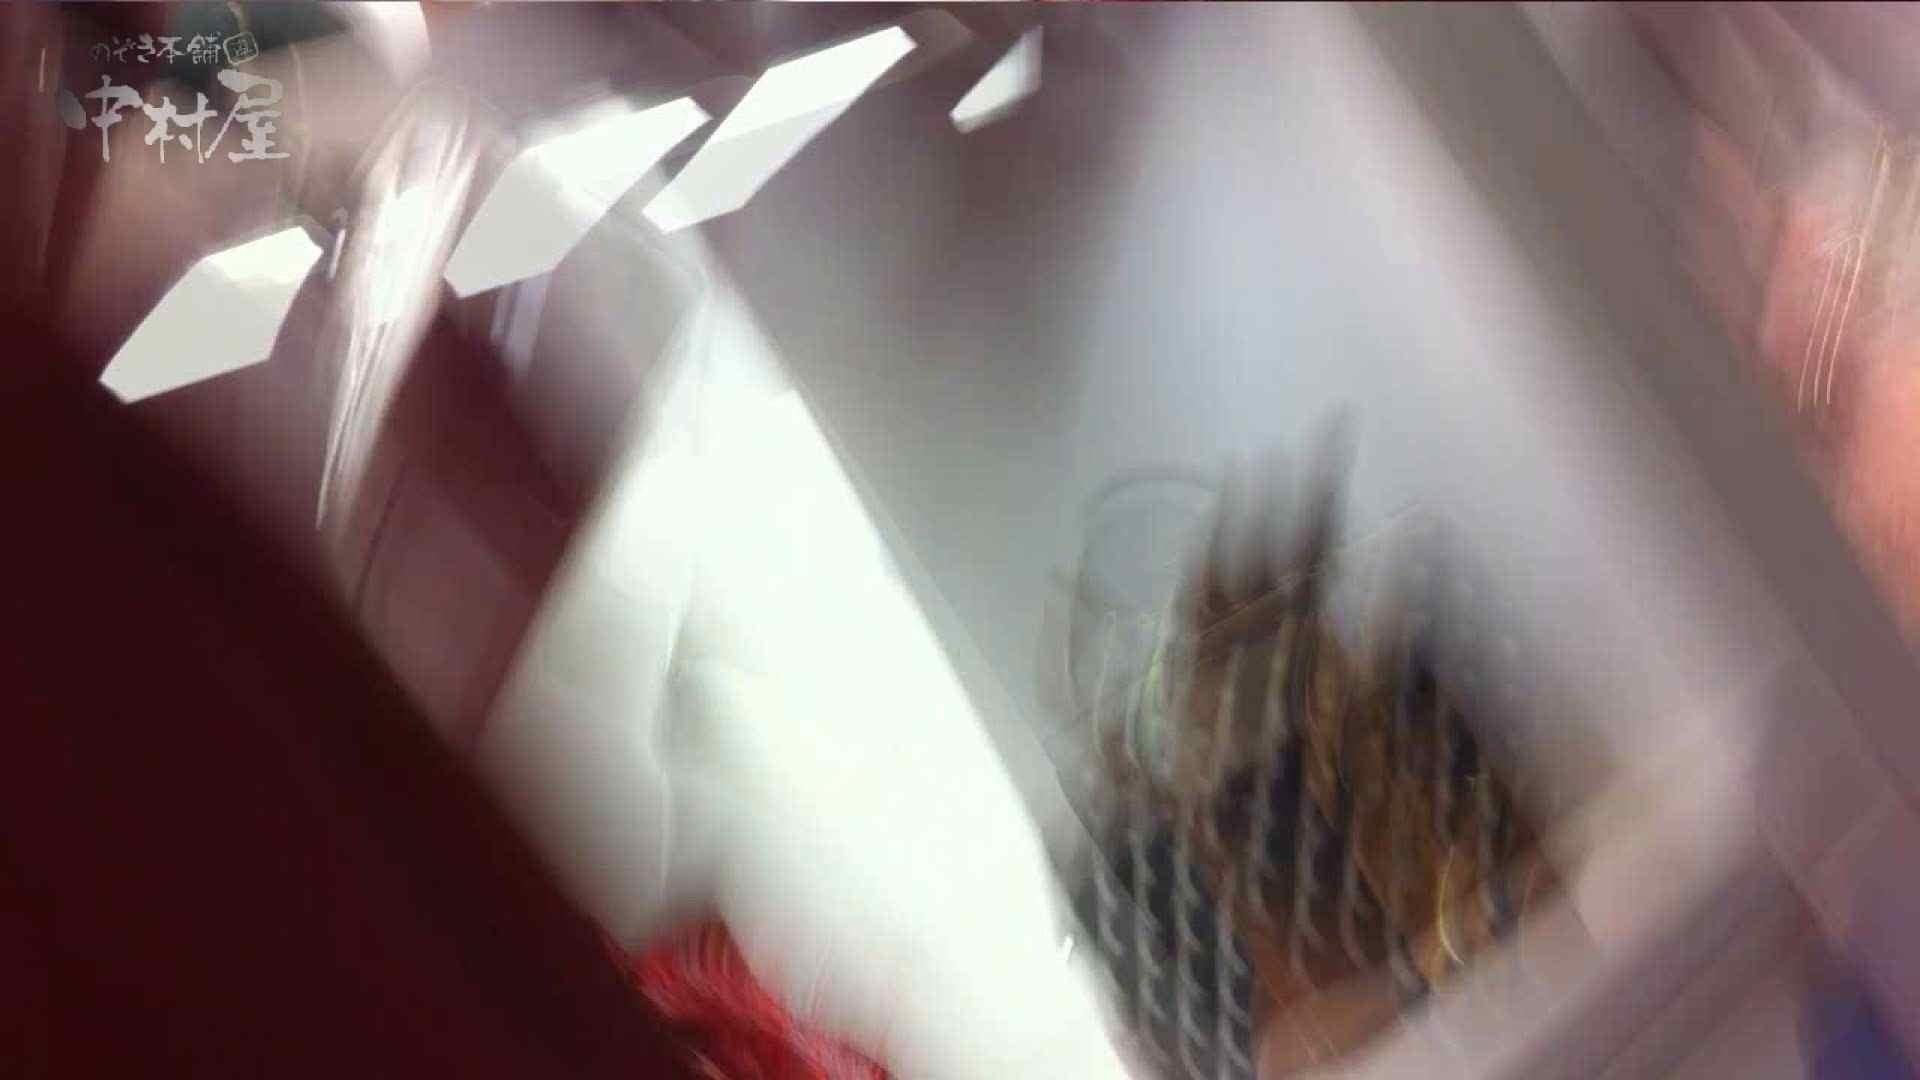 vol.70 美人アパレル胸チラ&パンチラ ベレー店員さんの下着 接写 AV動画キャプチャ 84PIX 37